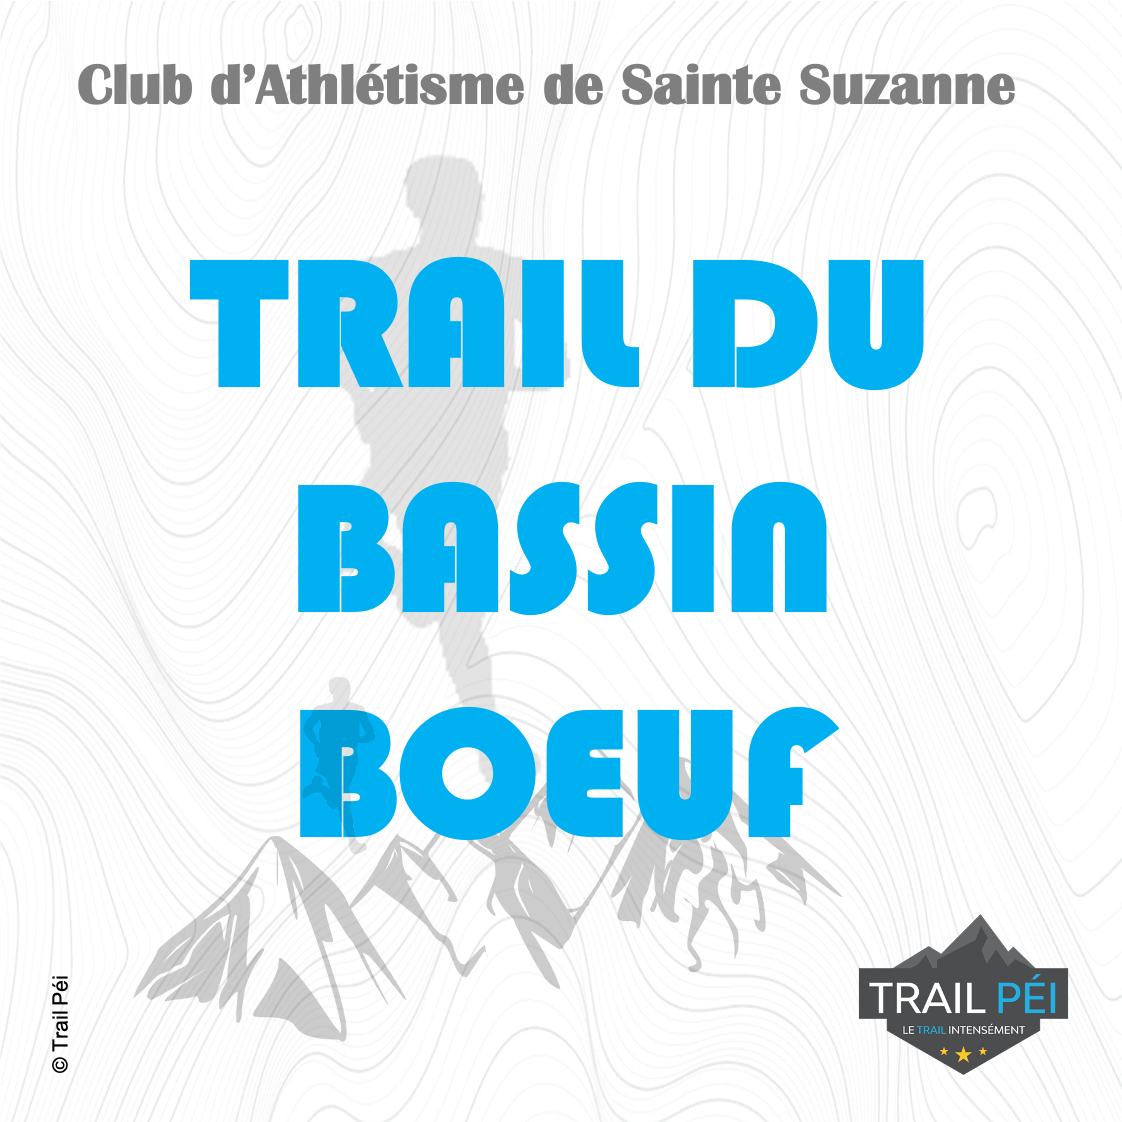 TP-Trail-Bassin-Boeuf